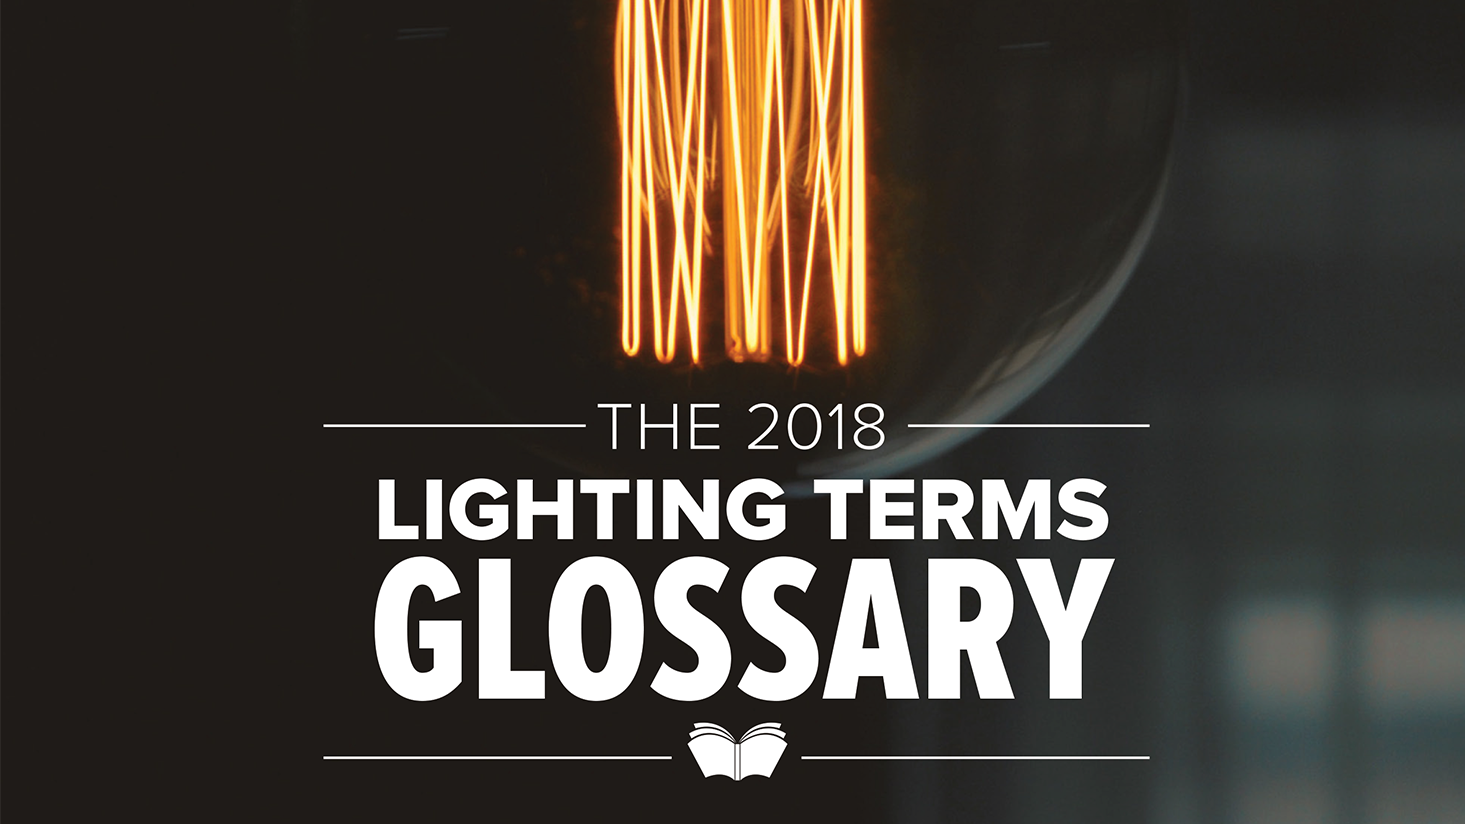 Lighting Terms Glossary: 2018 Edition